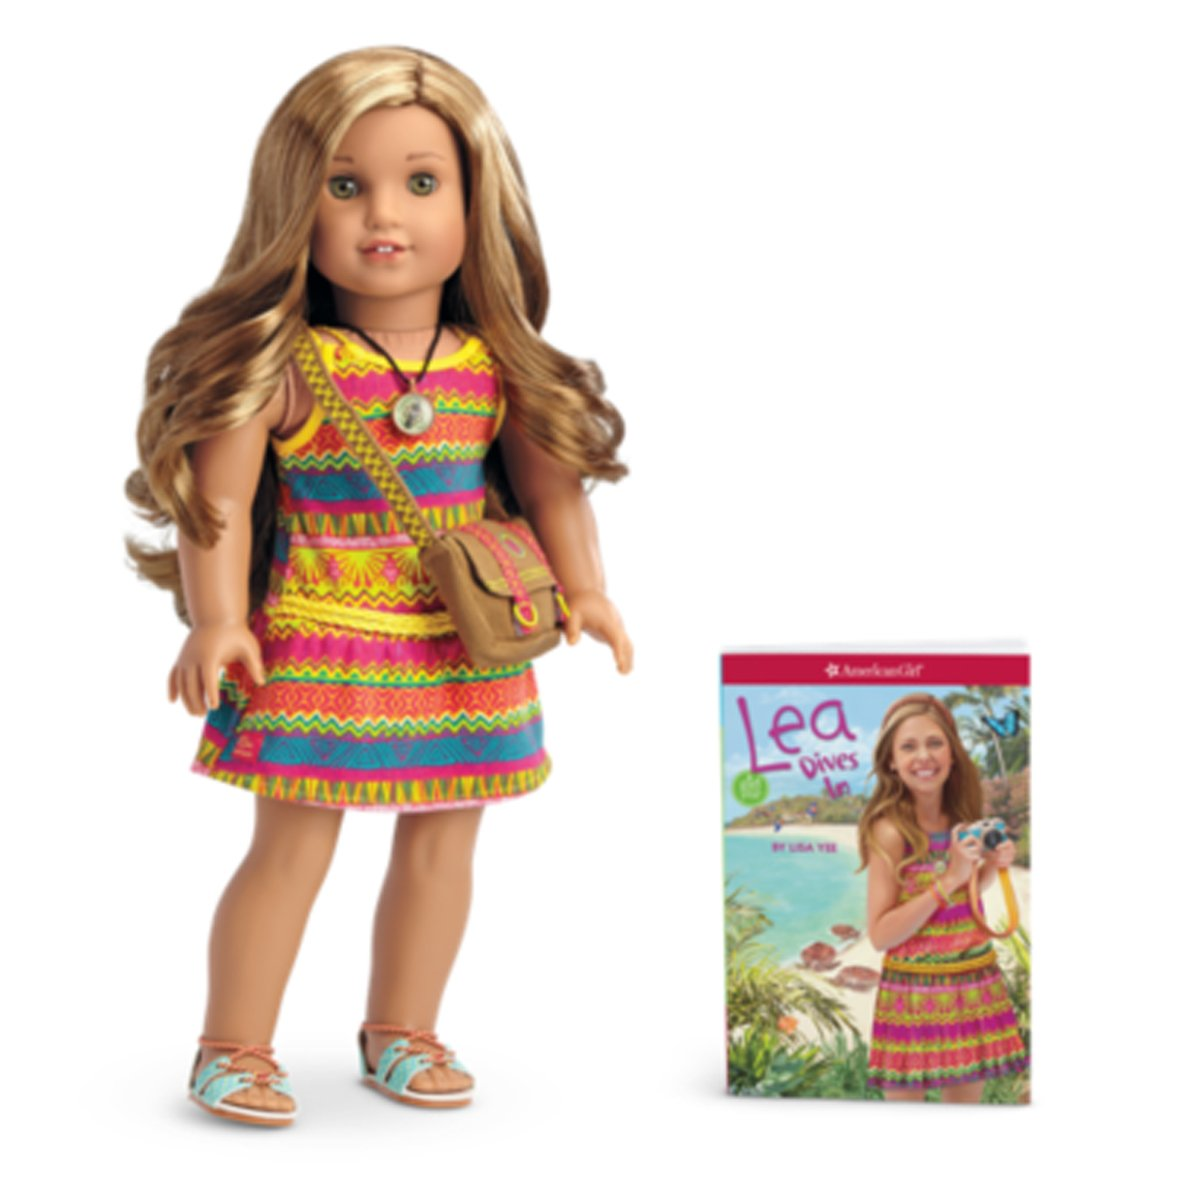 2016 American Girl Doll Lea Clark